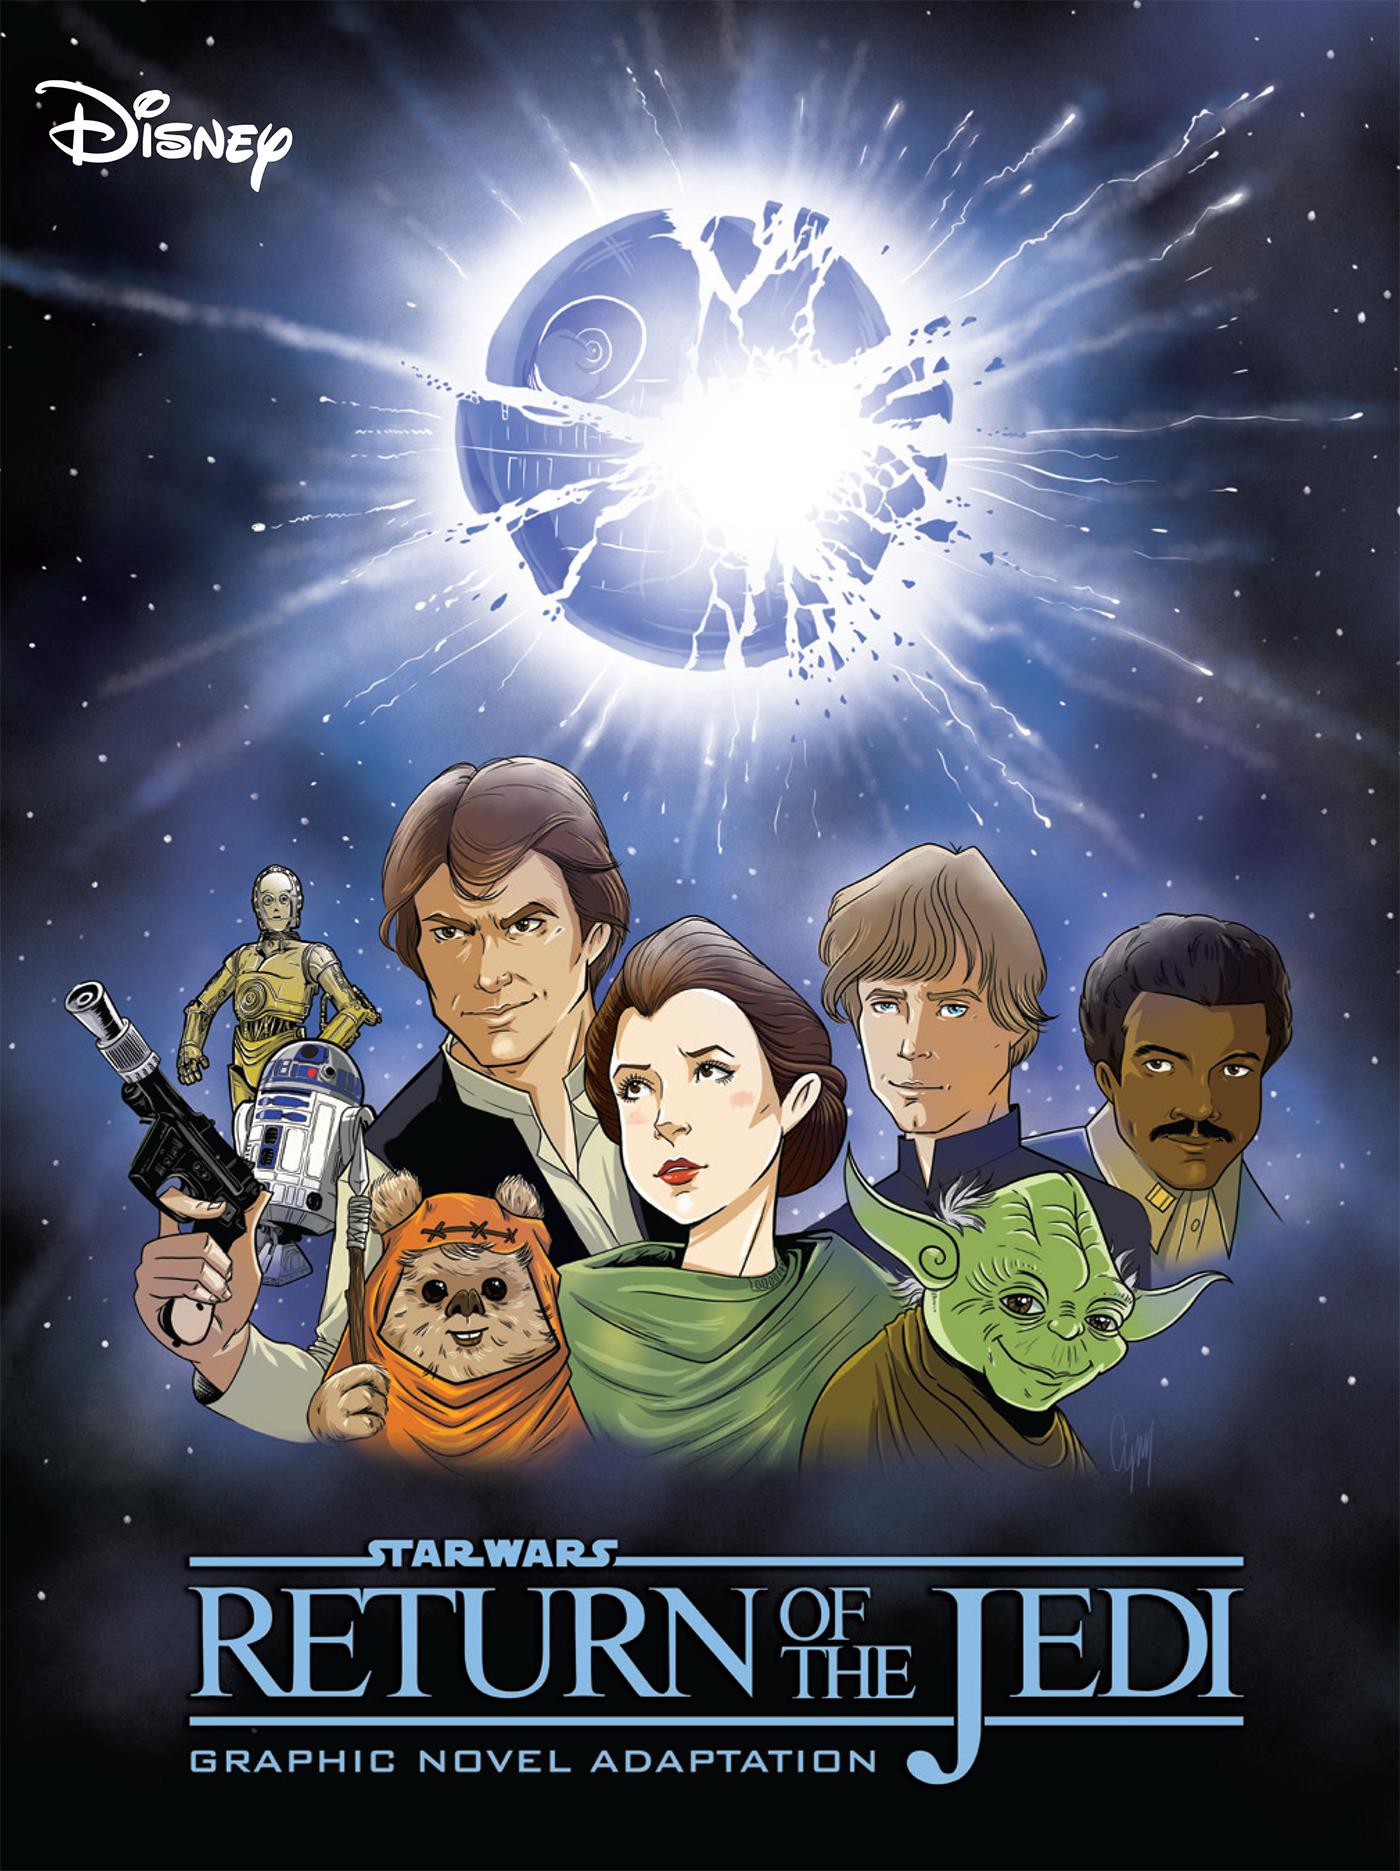 Star Wars: Return of the Jedi - Graphic Novel Adaptation (22.10.2019)